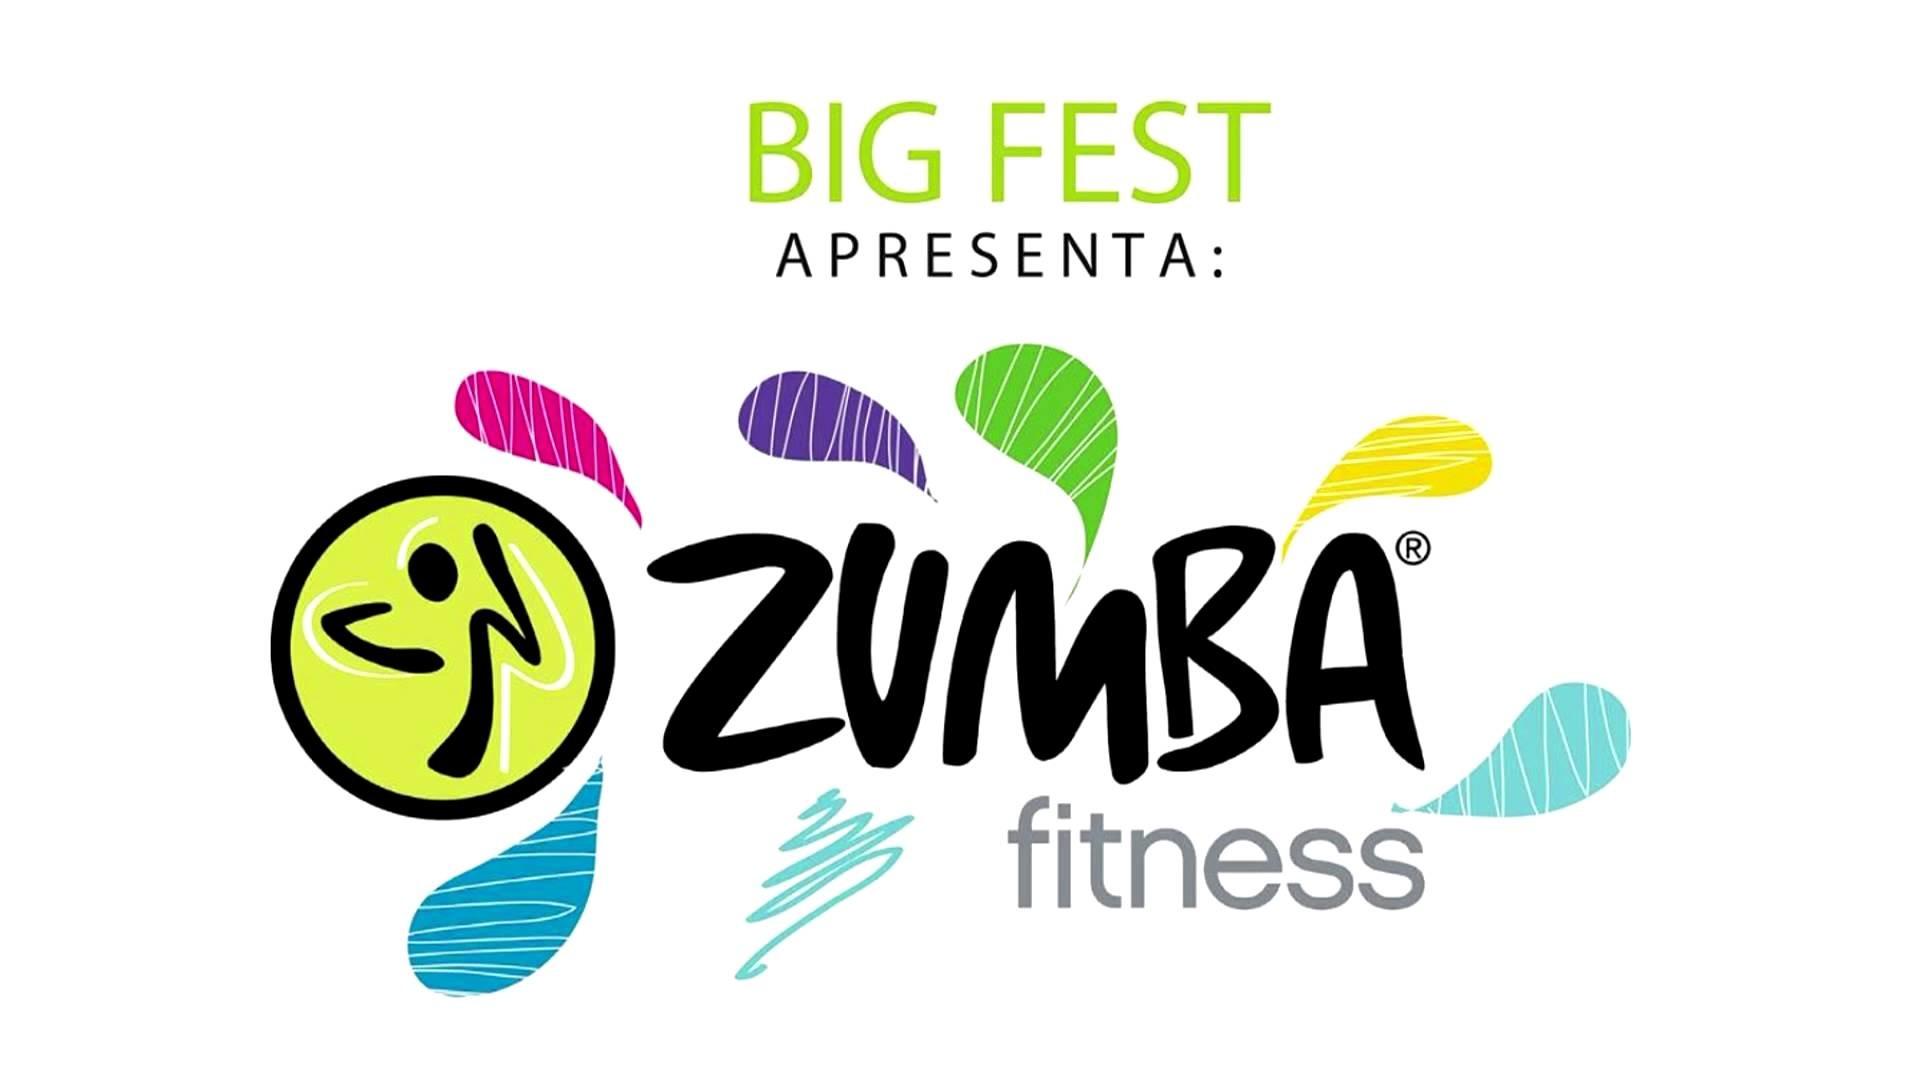 Zumba Fitness Wallpaper